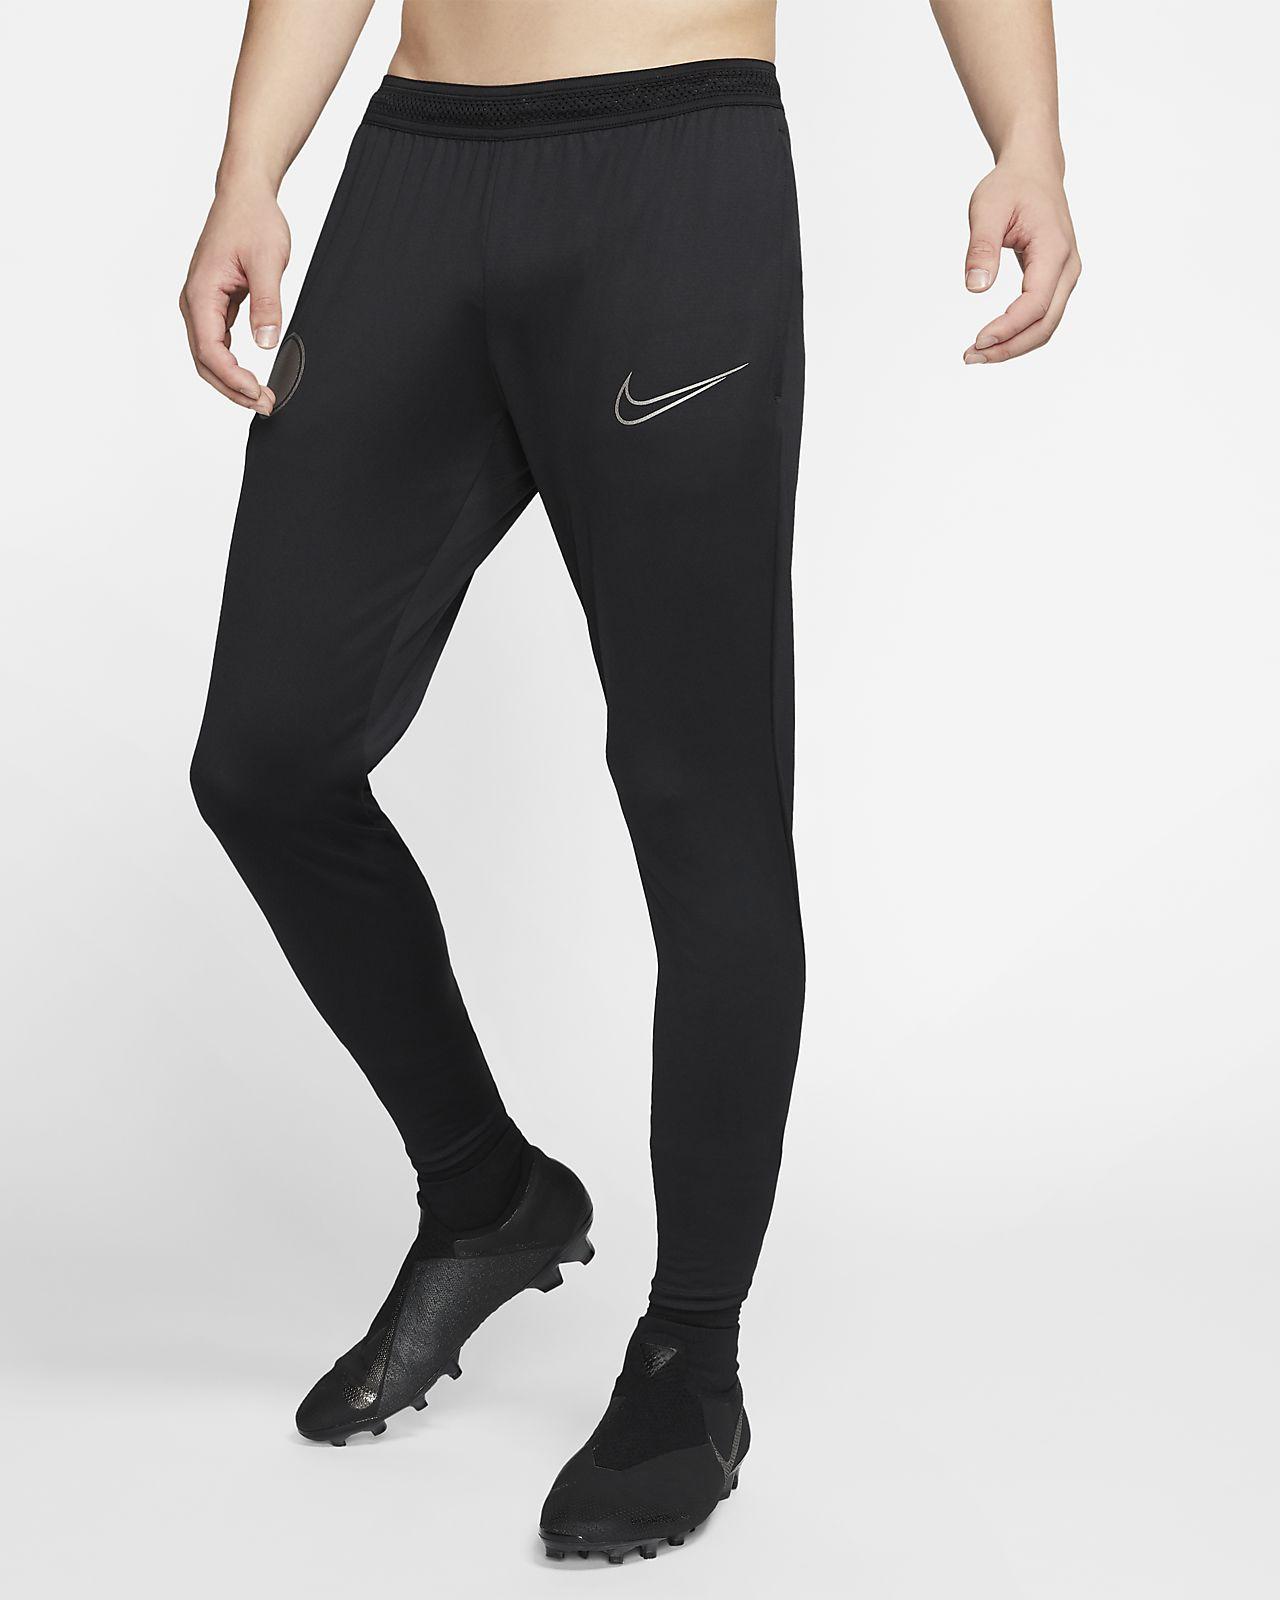 Nike Flex Strike Men's Football Pants